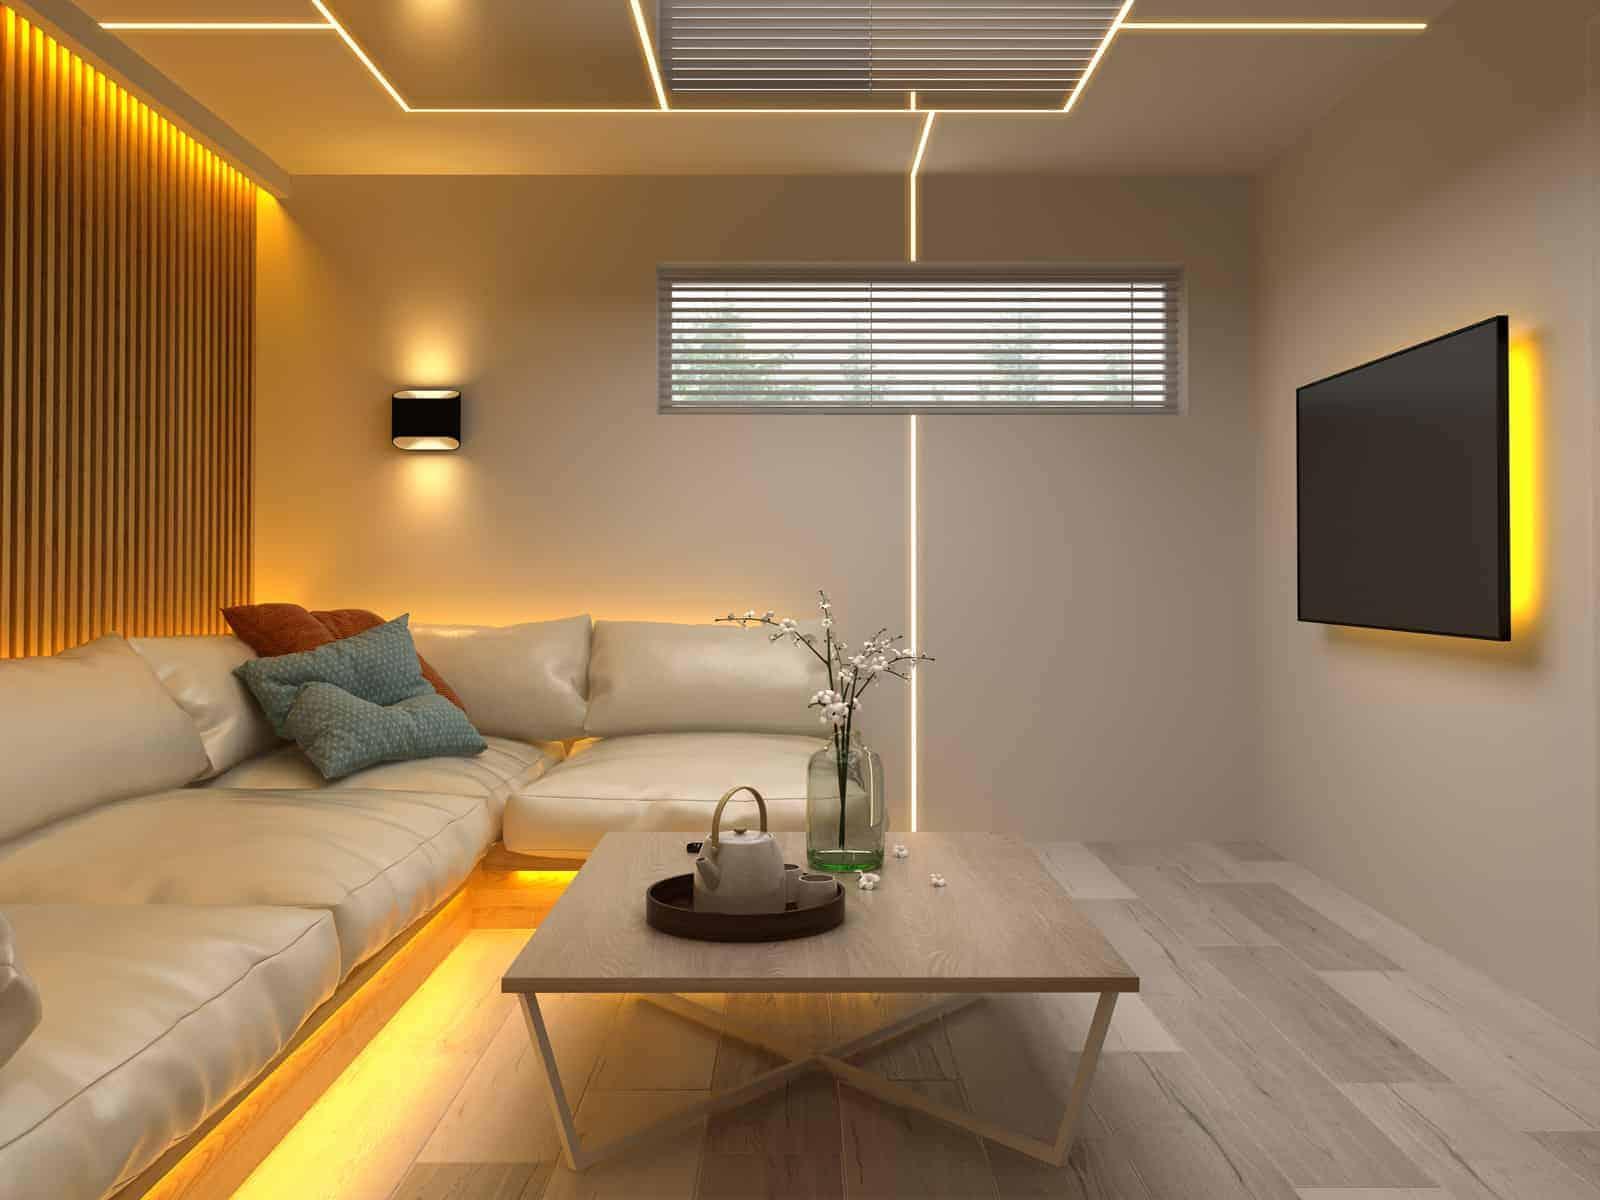 interior modern design room 3d illustration PL5TCZA The Plus Addons for Elementor